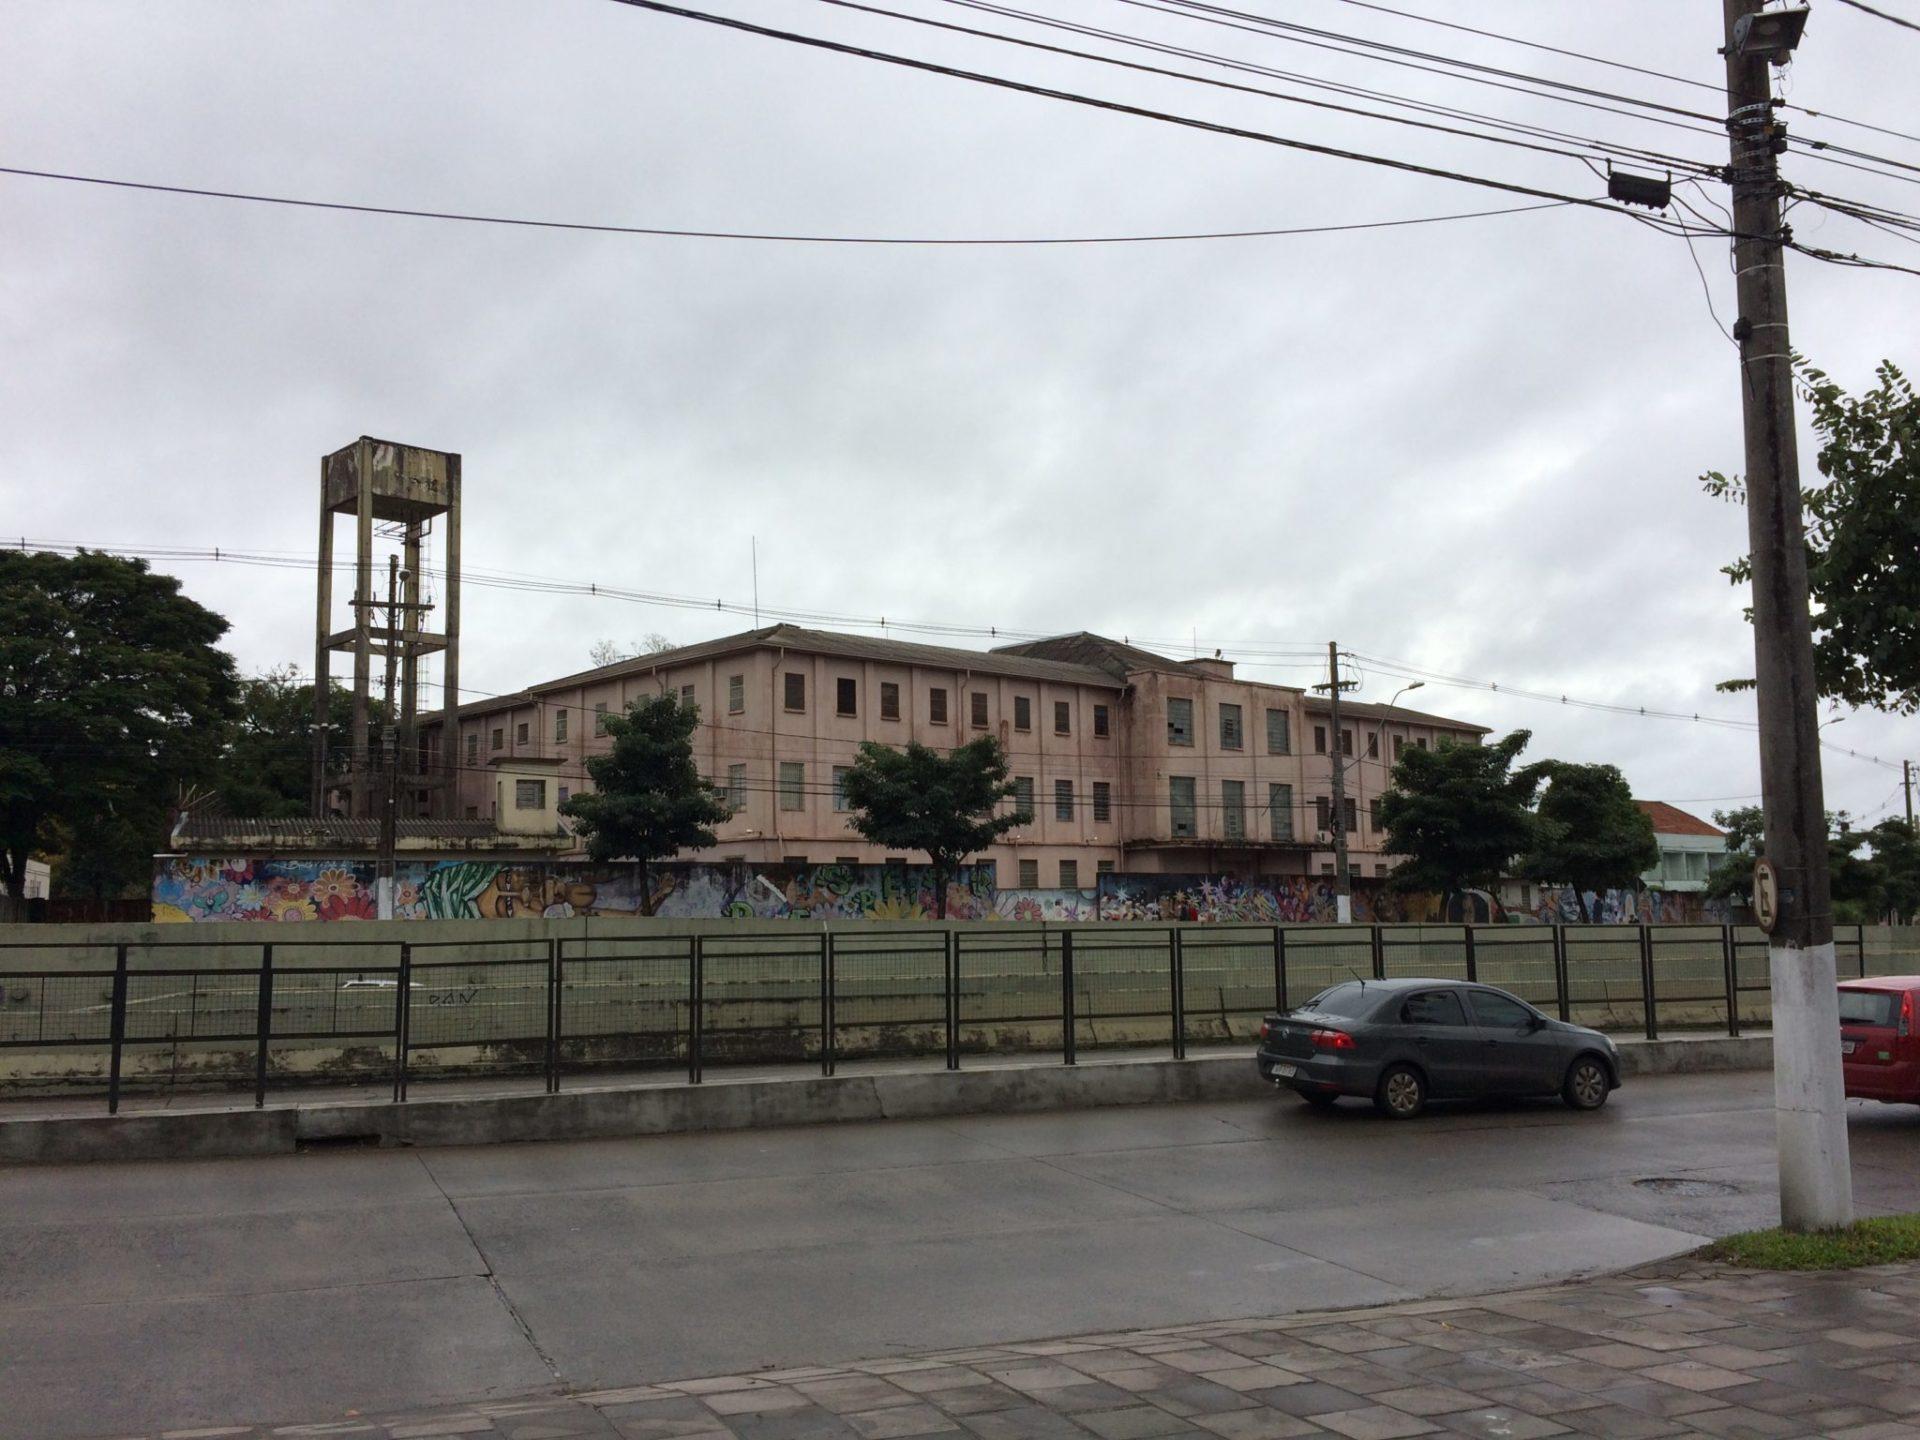 Penitenciária Feminina Madre Pelletier. Foto: Jaguatiritica - Obra do próprio, CC BY-SA 4.0, https://commons.wikimedia.org/w/index.php?curid=59769215